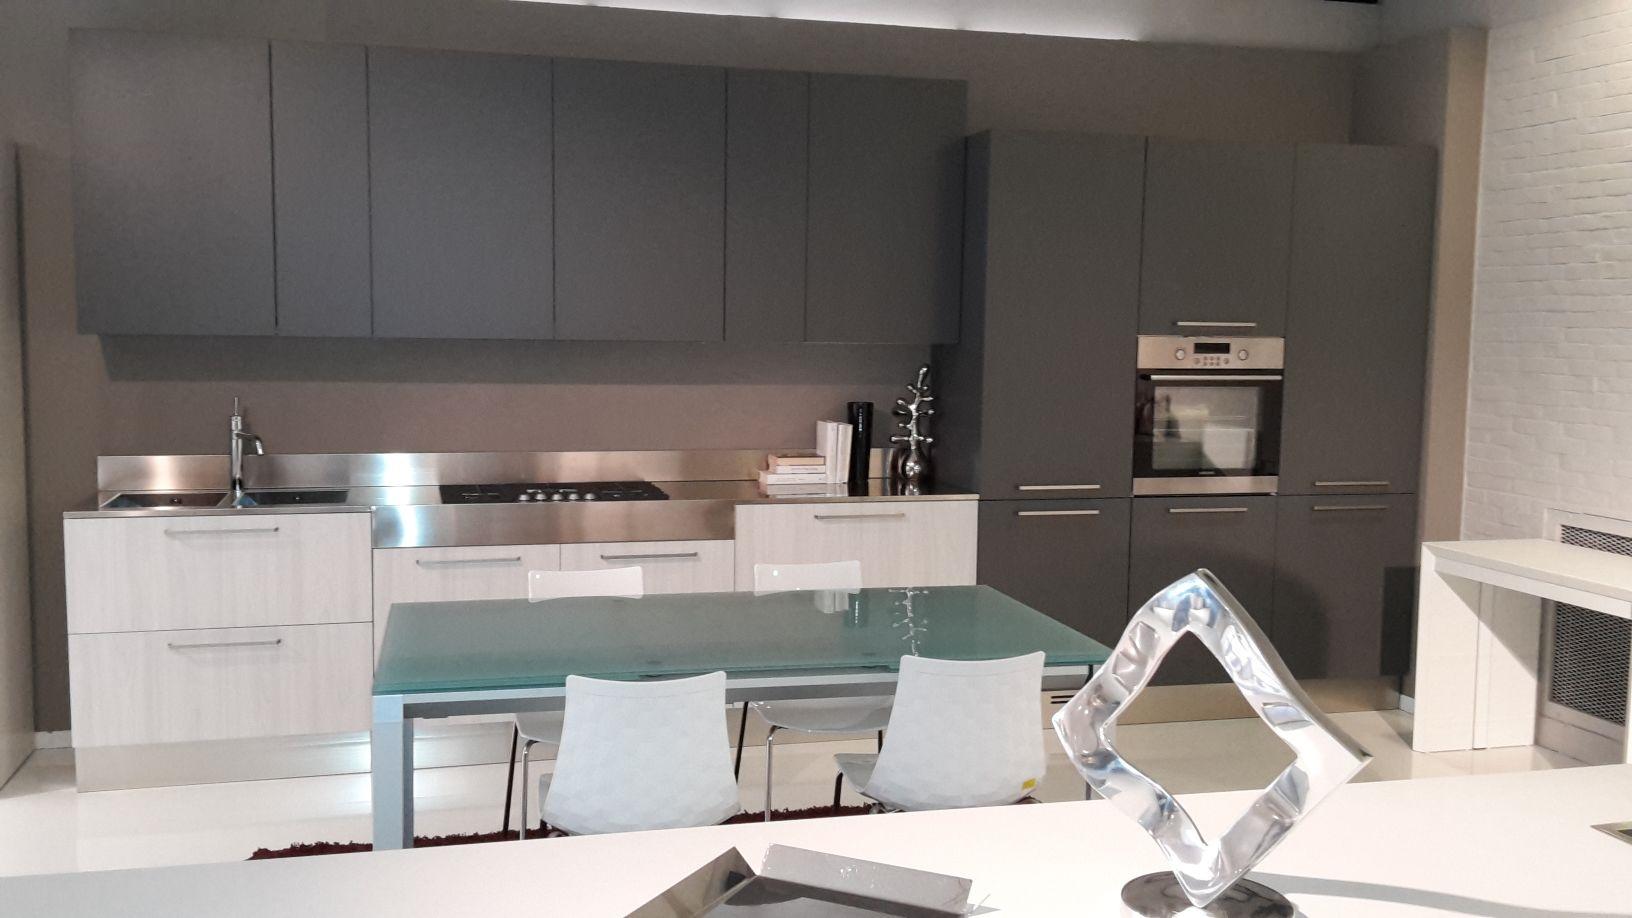 Cucina luna laminato olmo bianco e grigio grafite cucine - Cucina grigia colore pareti ...